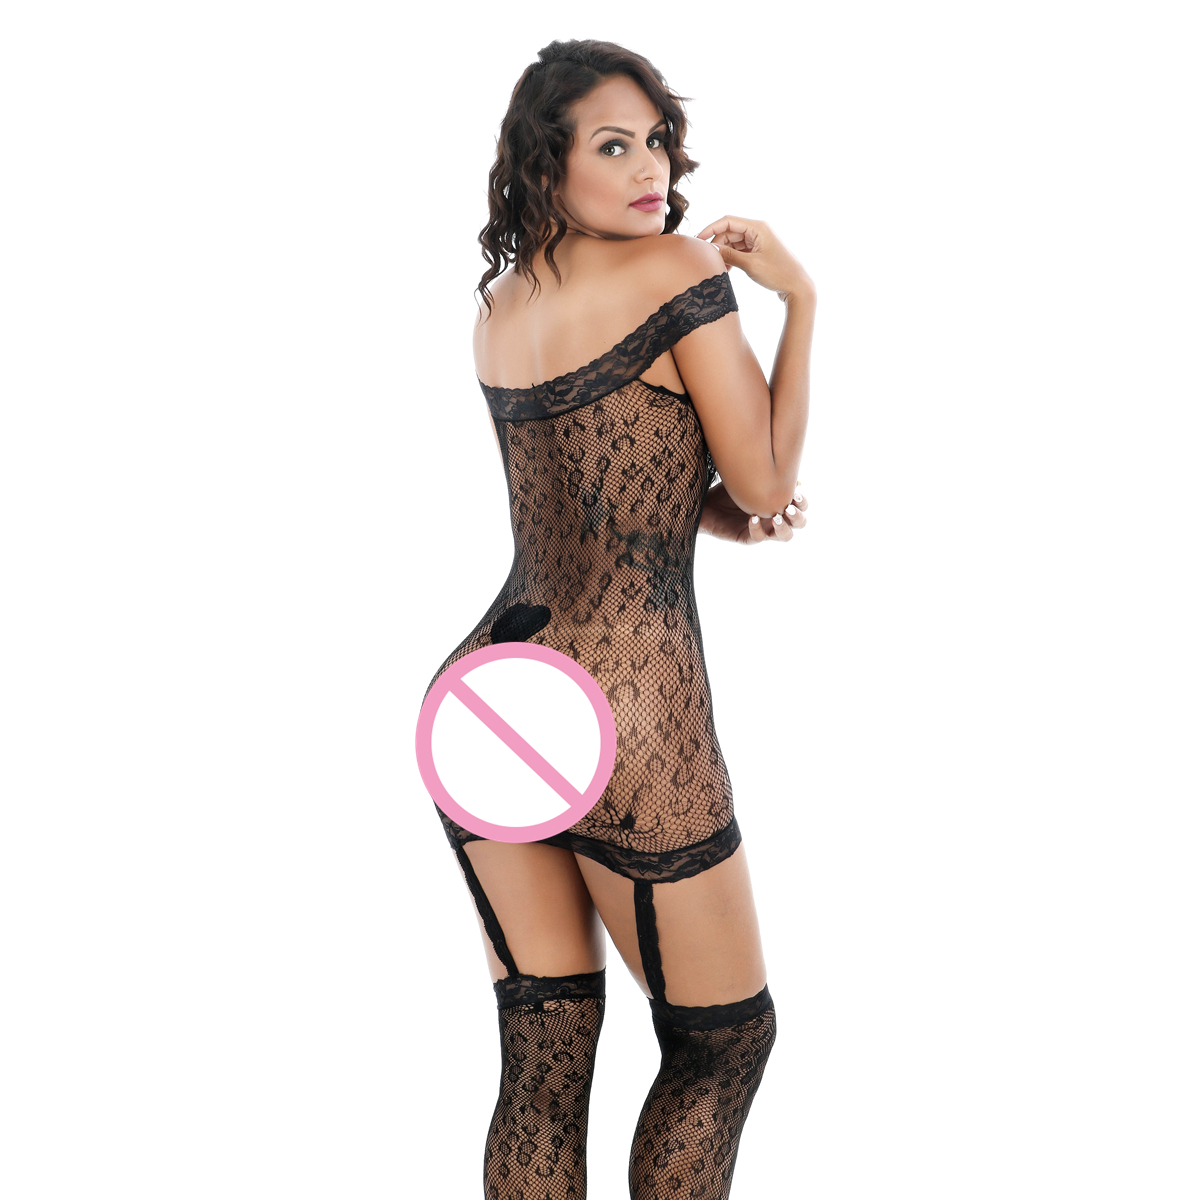 9 Style Leopard Women Sexy Lingerie Hot Plus Size Porn Intimates Underwear Sex Costumes Open Crotch Lingerie Exotic Apparel